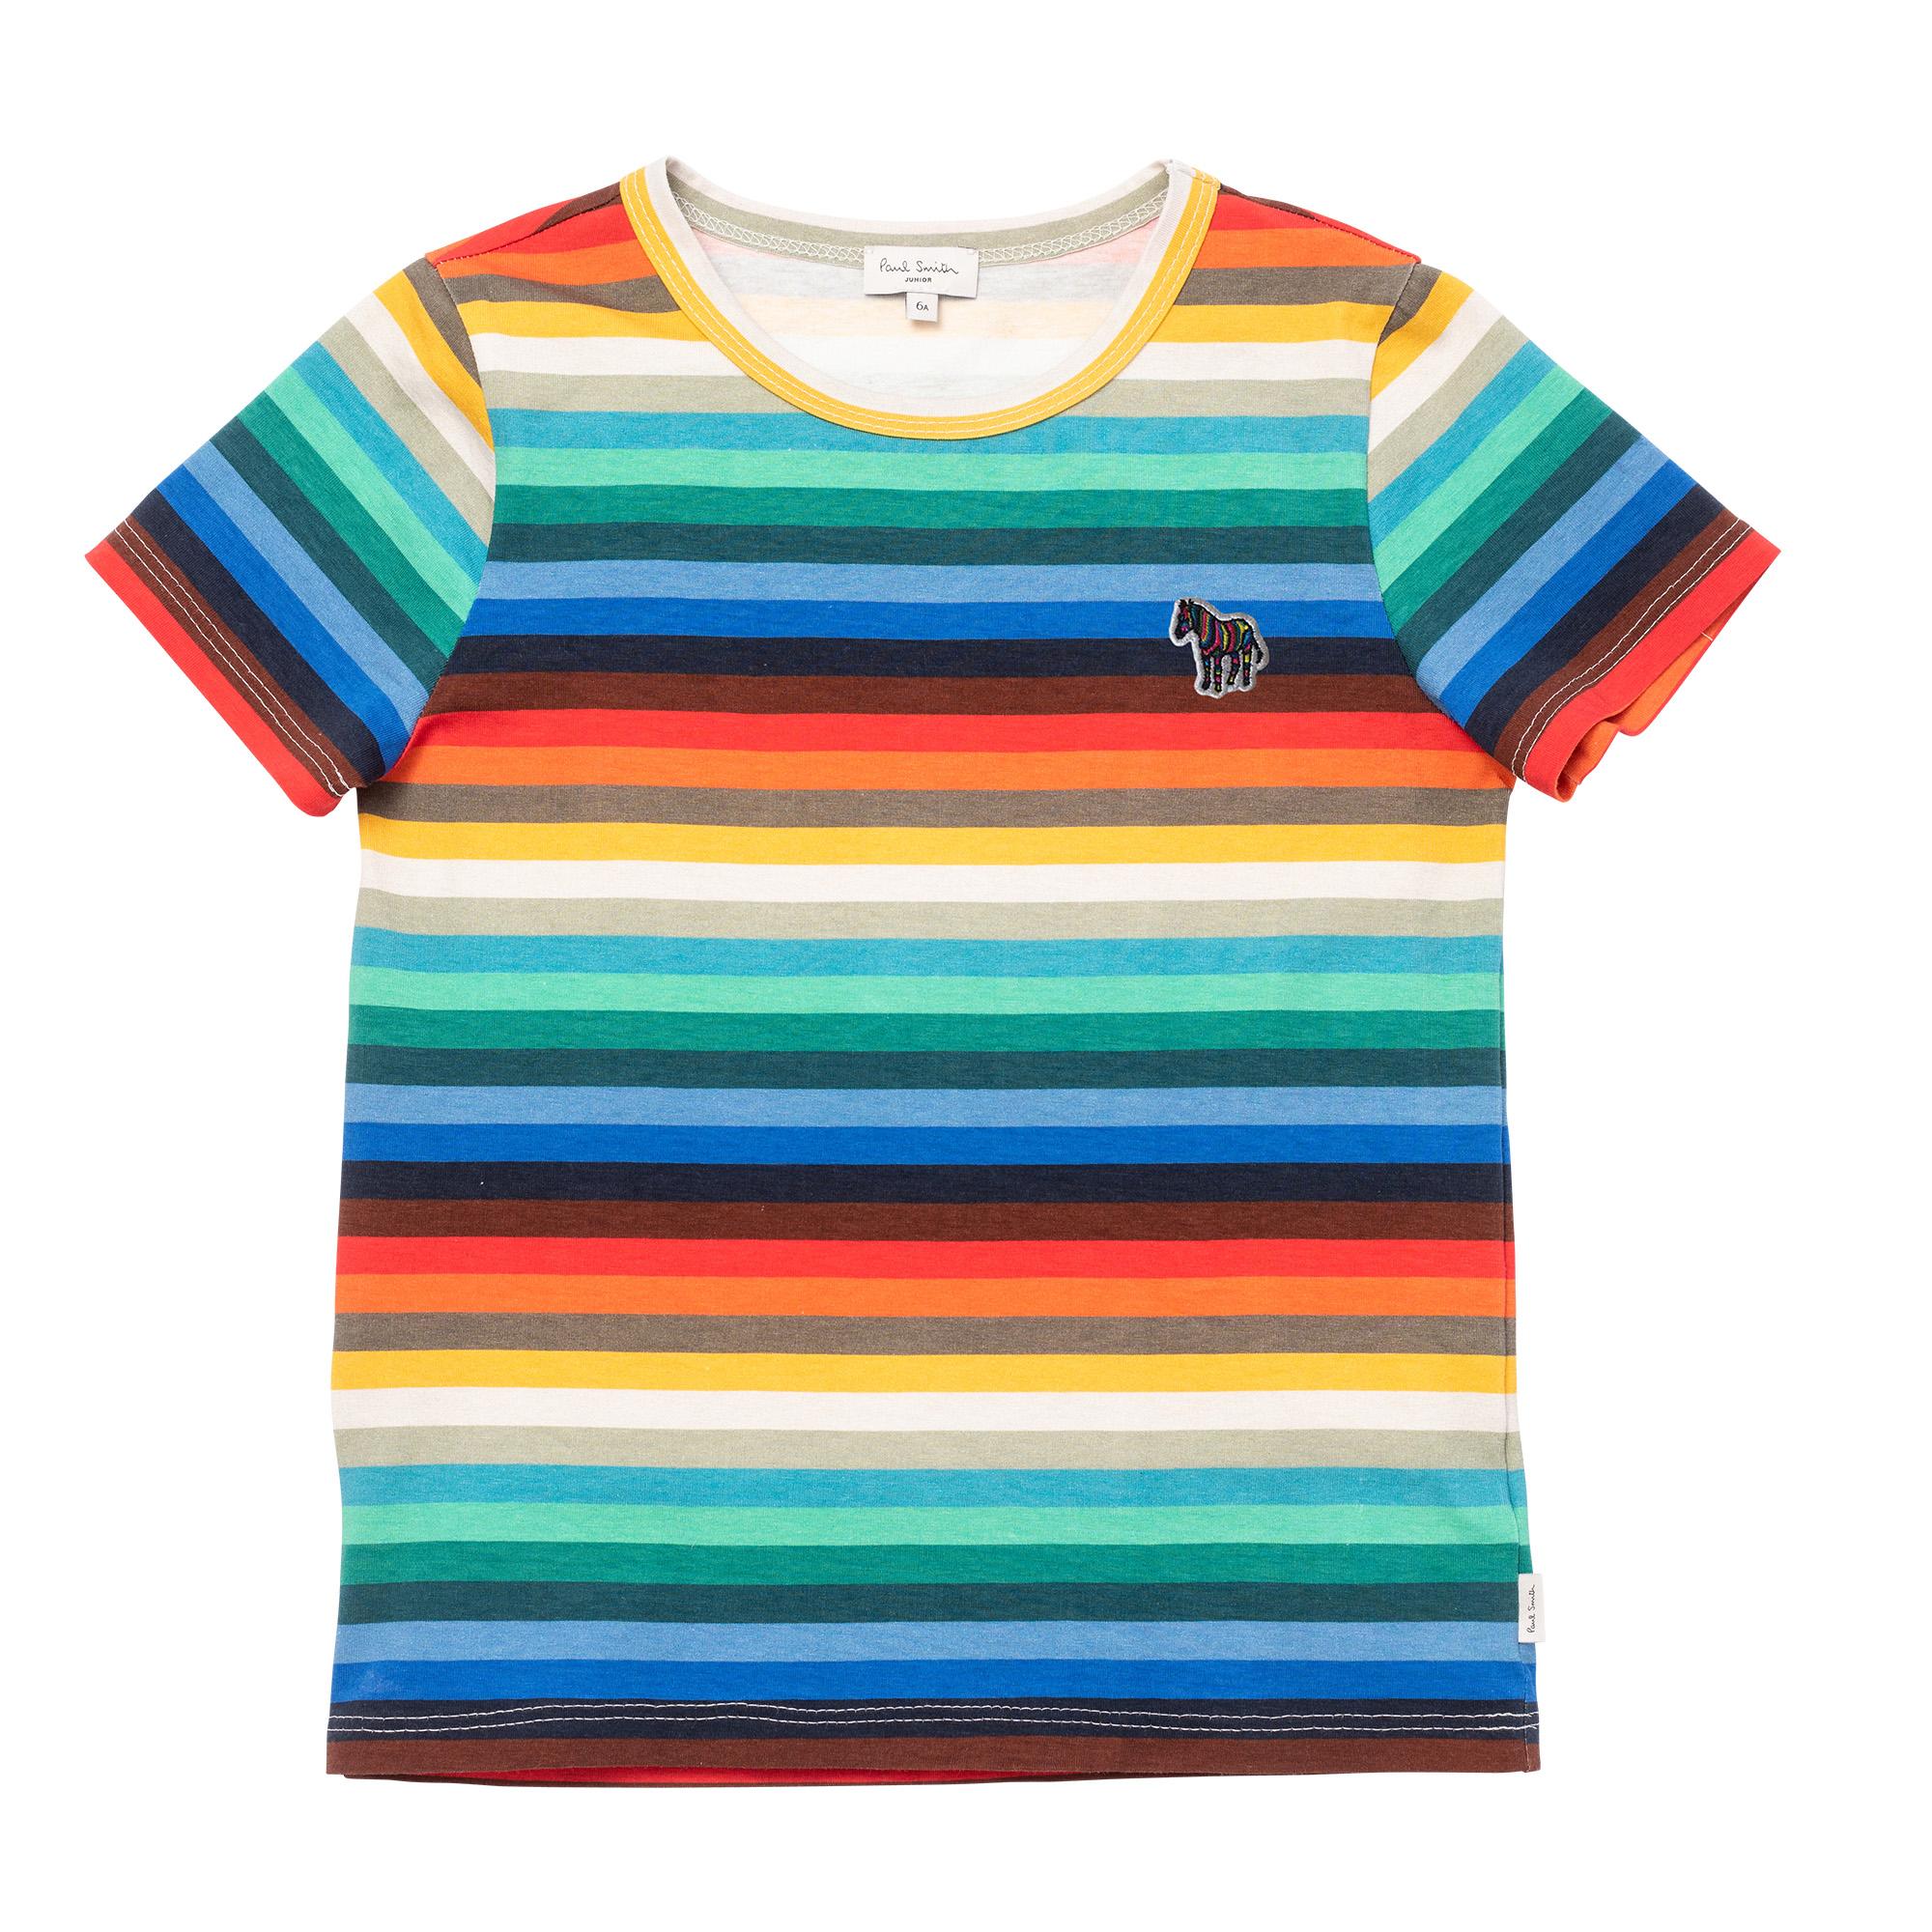 Short-sleeved jersey T-shirt PAUL SMITH JUNIOR for BOY